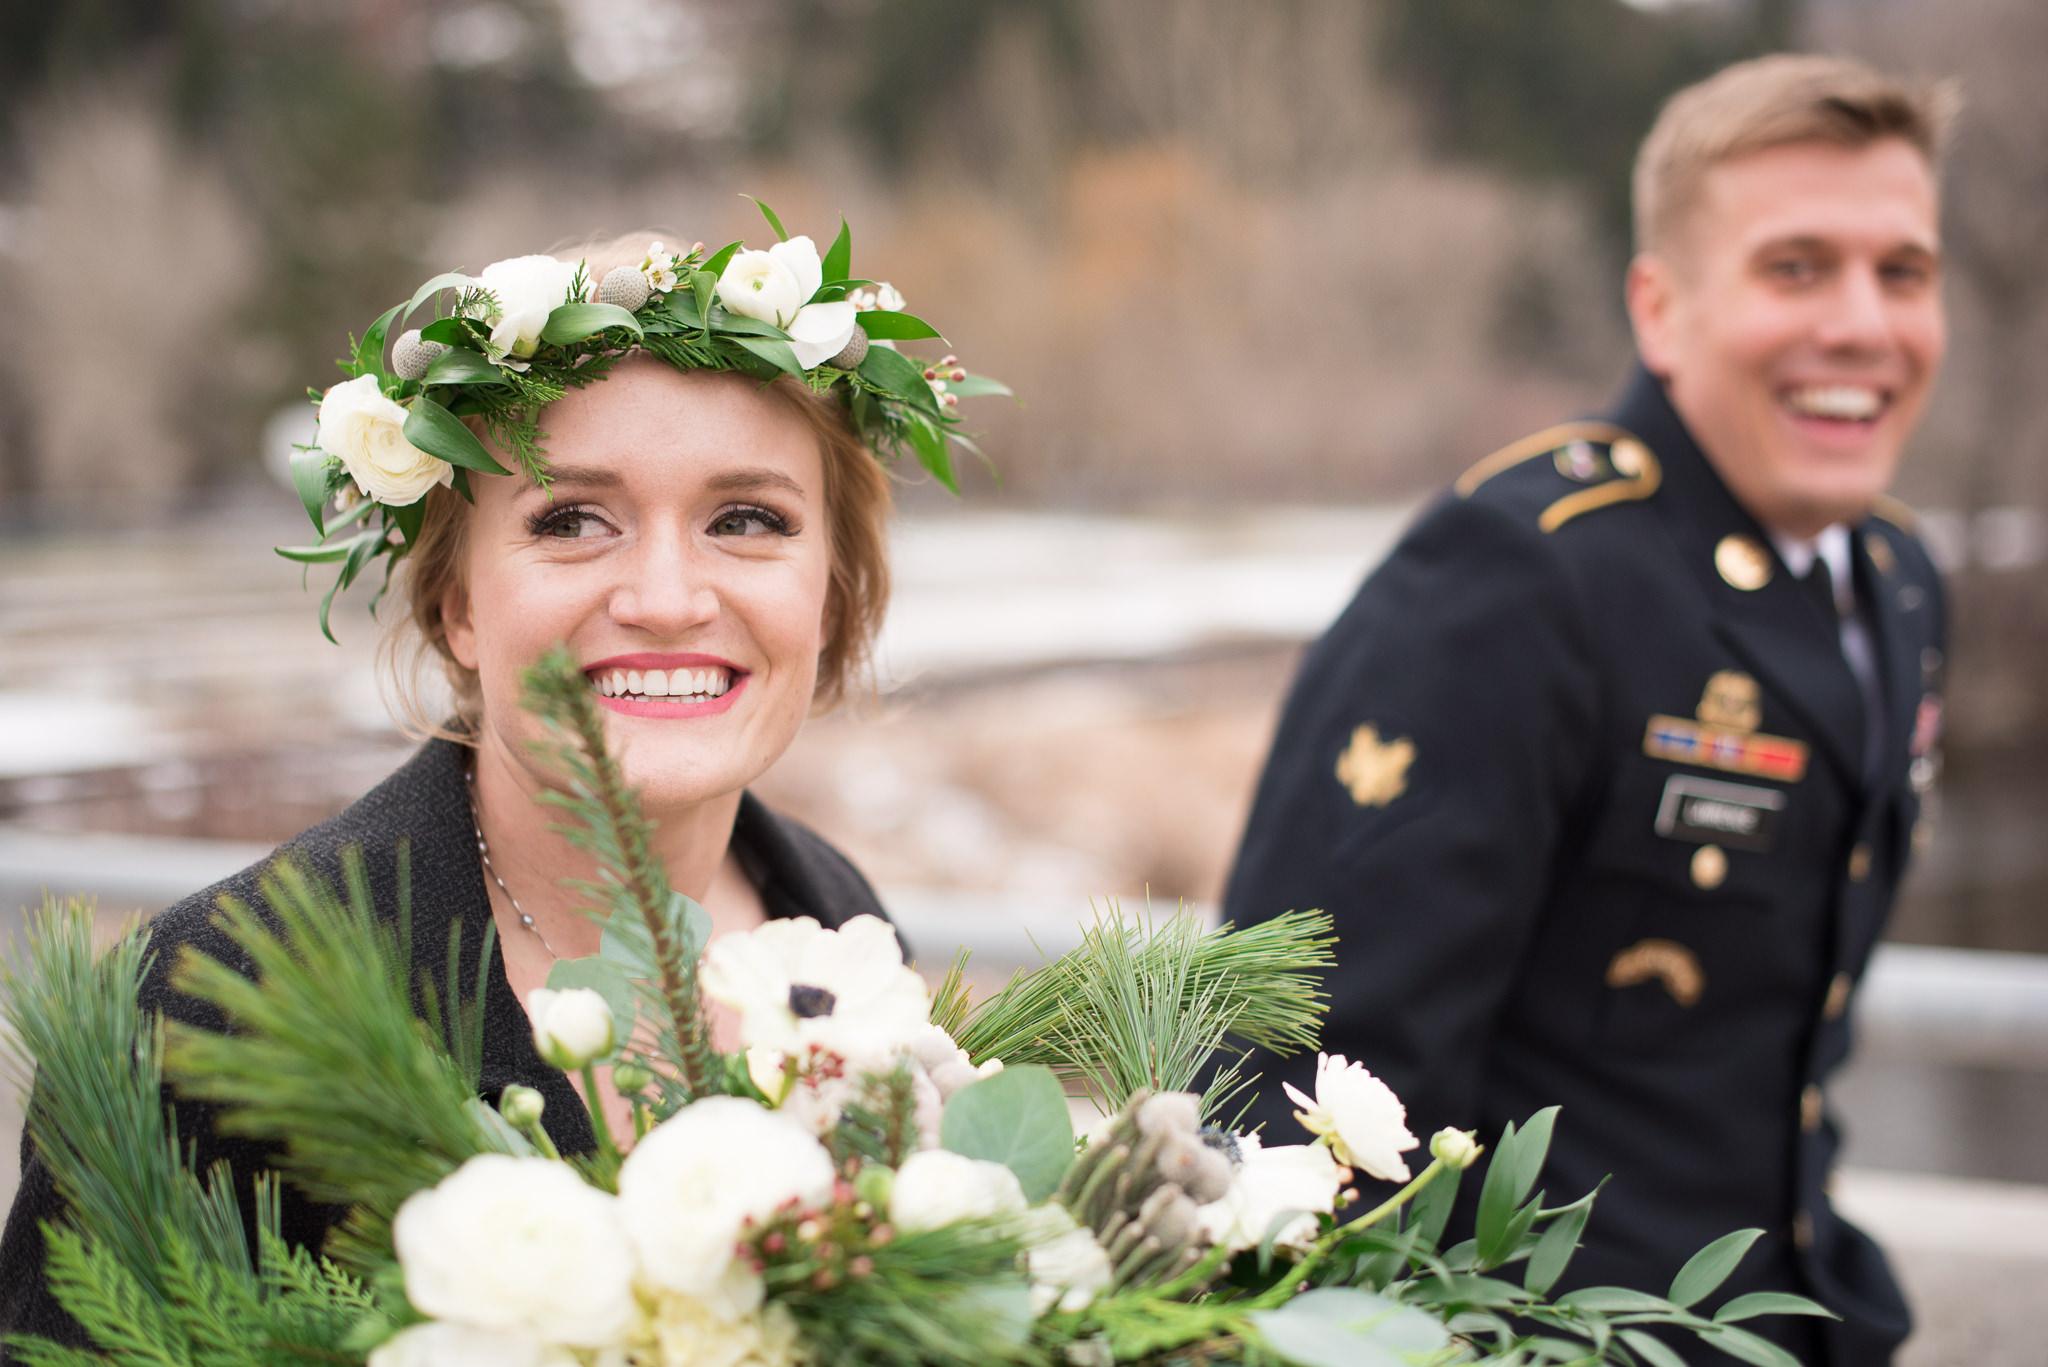 Trevor-Hooper-Wedding-Photographer-The-Bungalow-Wedding-Utah_CLR_014.jpg